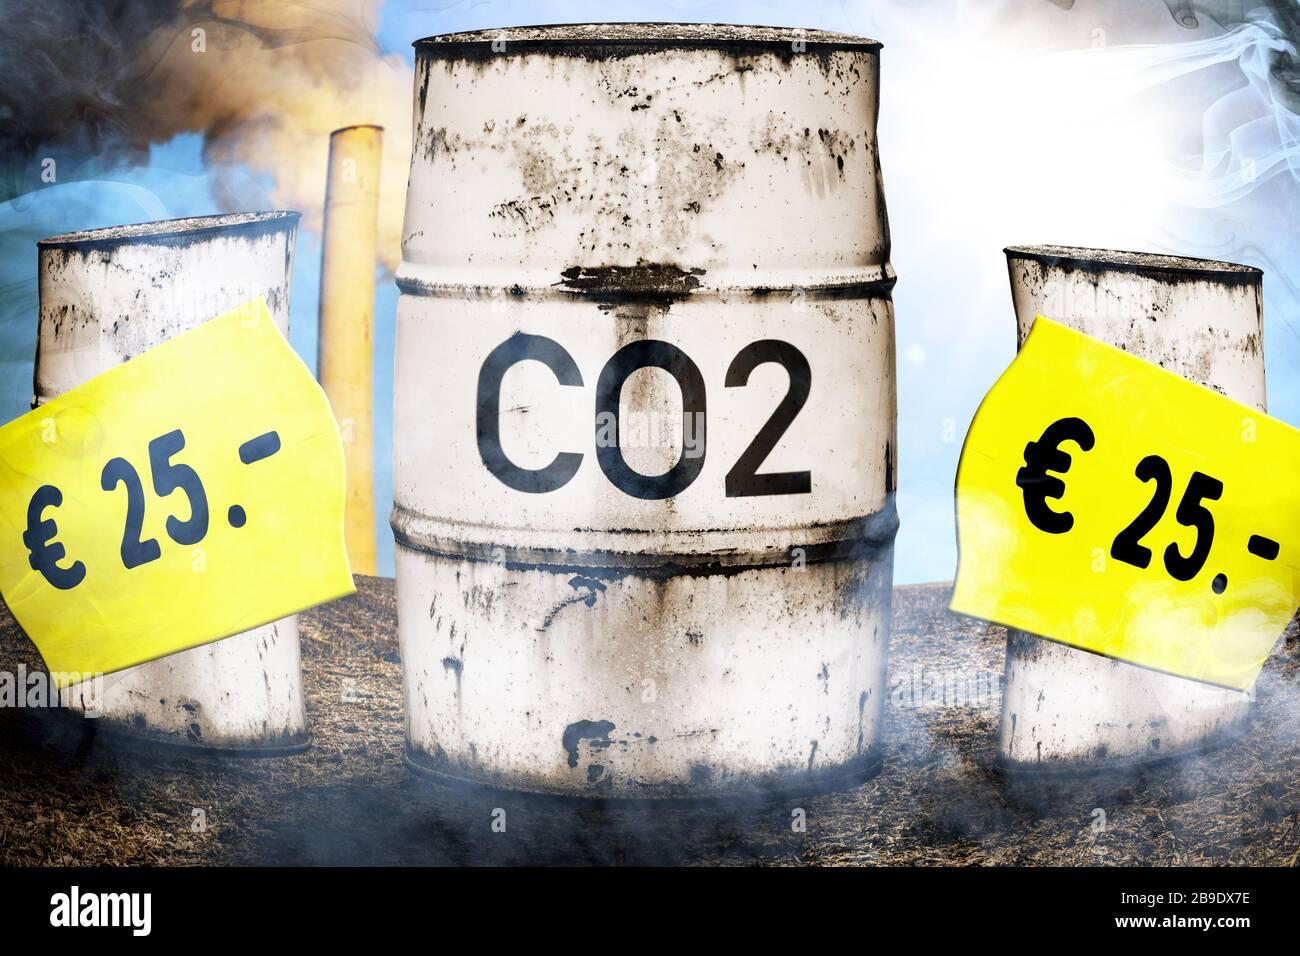 PHOTOMONTAGE, tonnes with label CO2 and prize etiquettes, symbolic photo CO2-Bepreisung and CO2 tax, FOTOMONTAGE, Tonnen mit Aufschrift CO2 und Preise Stock Photo